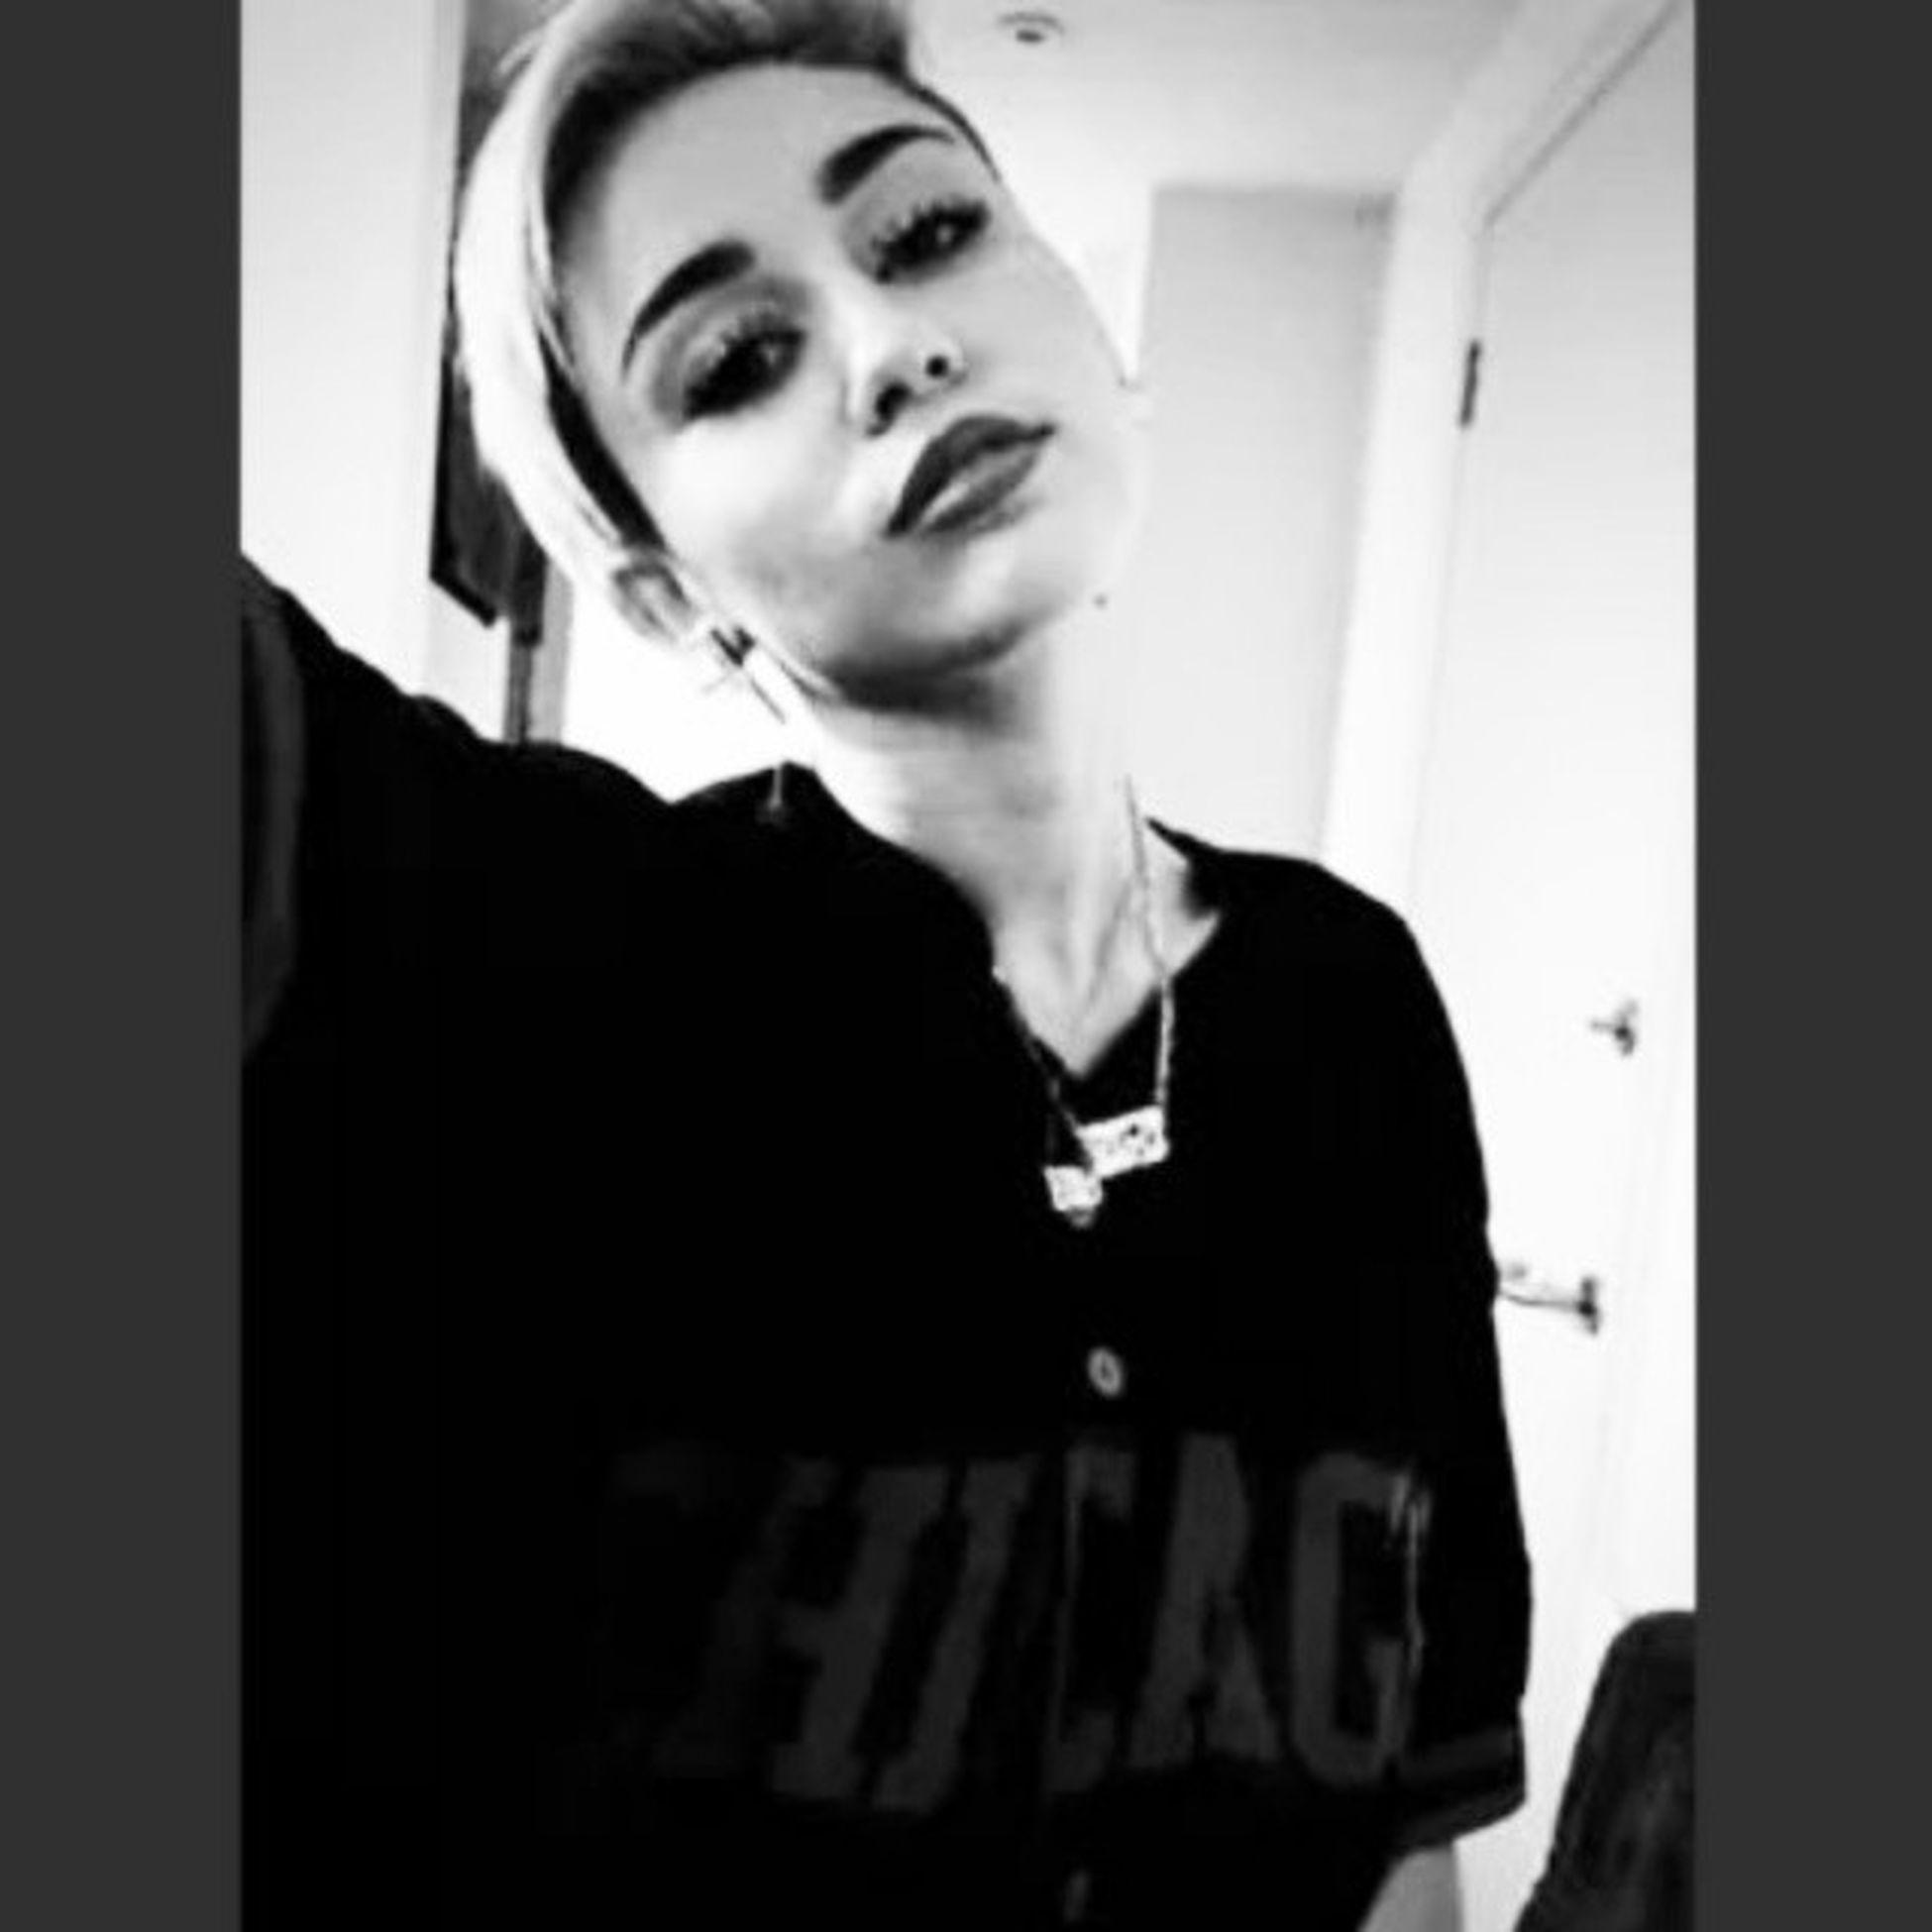 She's so BEAUTIFUL. Milena Miley Pretty Sweet Serious SHEISNOTNORMAL Sheiscrazy ILOVEHERSTYLE ITSVERYBEAUTIFUL Strong Instacrazy Instaserious Instaidol